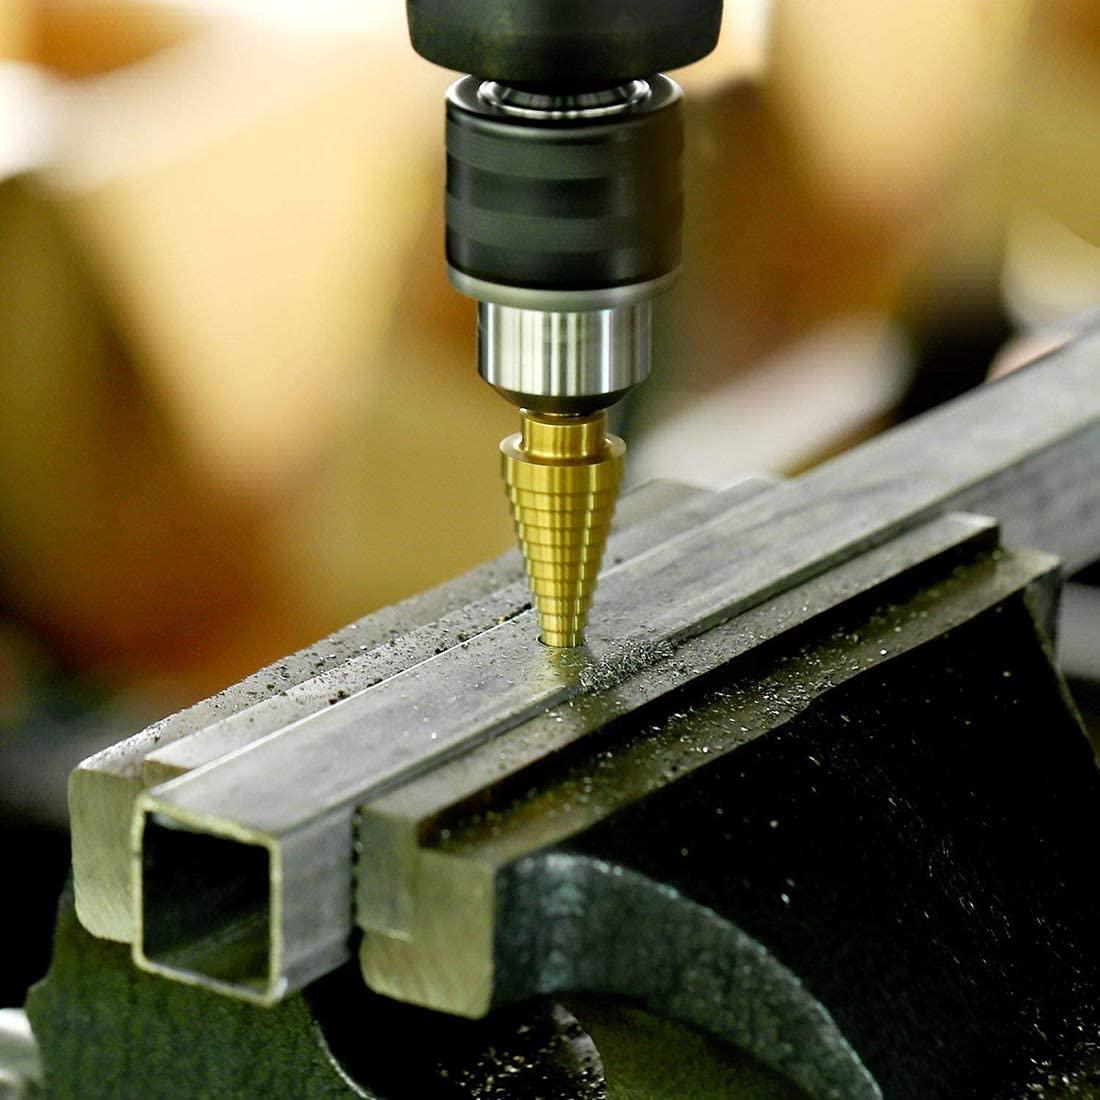 3pcs/set 3-12mm 4-12mm 4-20mm HSS Straight Groove Step Drill Bit Set Titanium Coated Wood Metal Hole Cutter Core Drill Bit Set